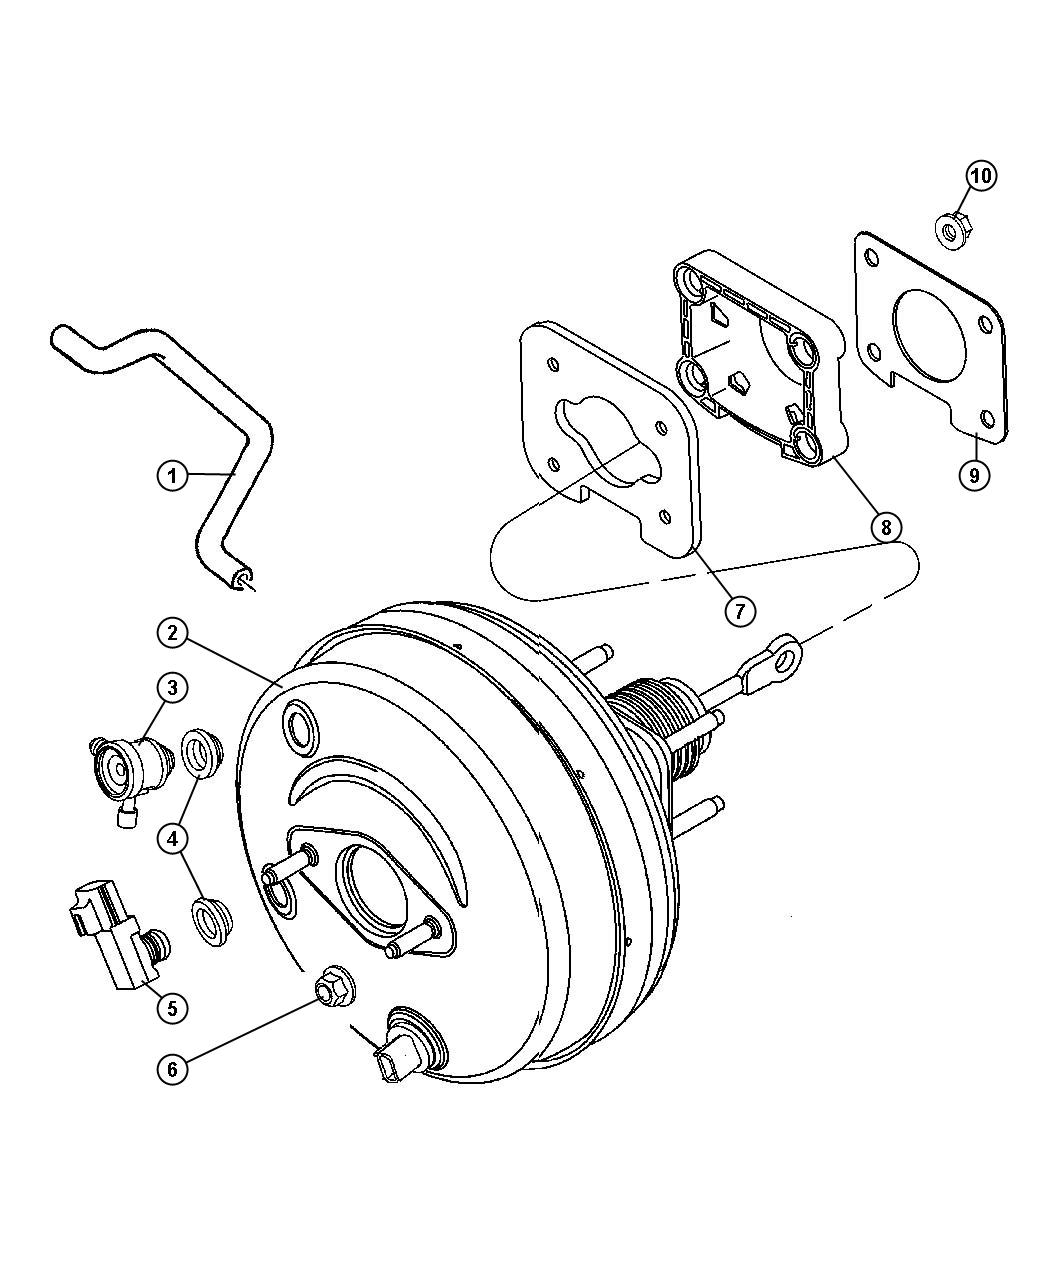 2007 Dodge Durango Booster. Power brake. Brakes, anti